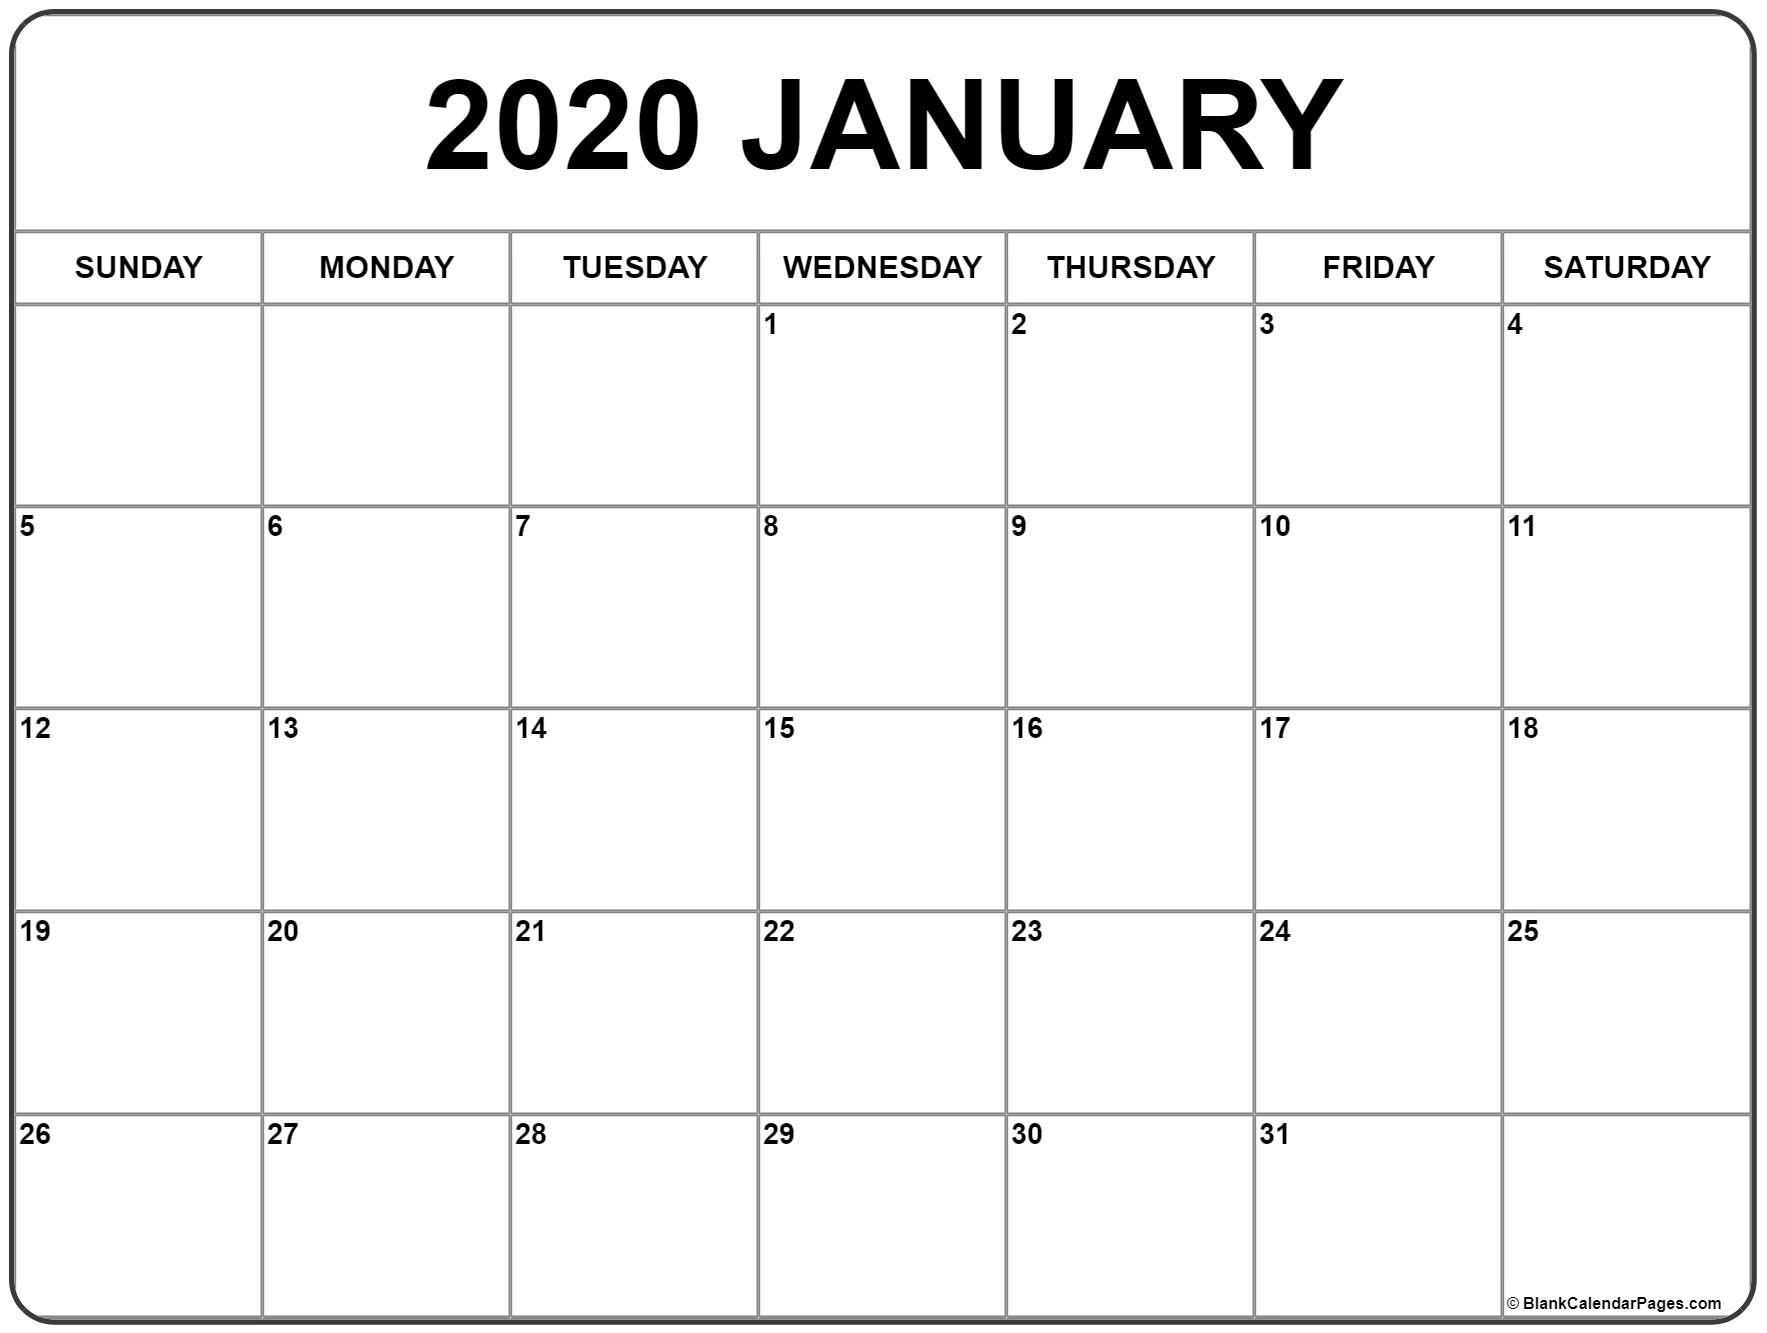 January 2020 Calendar | Free Printable Monthly Calendars-2020 Printable Microsoft Word Calendar Template